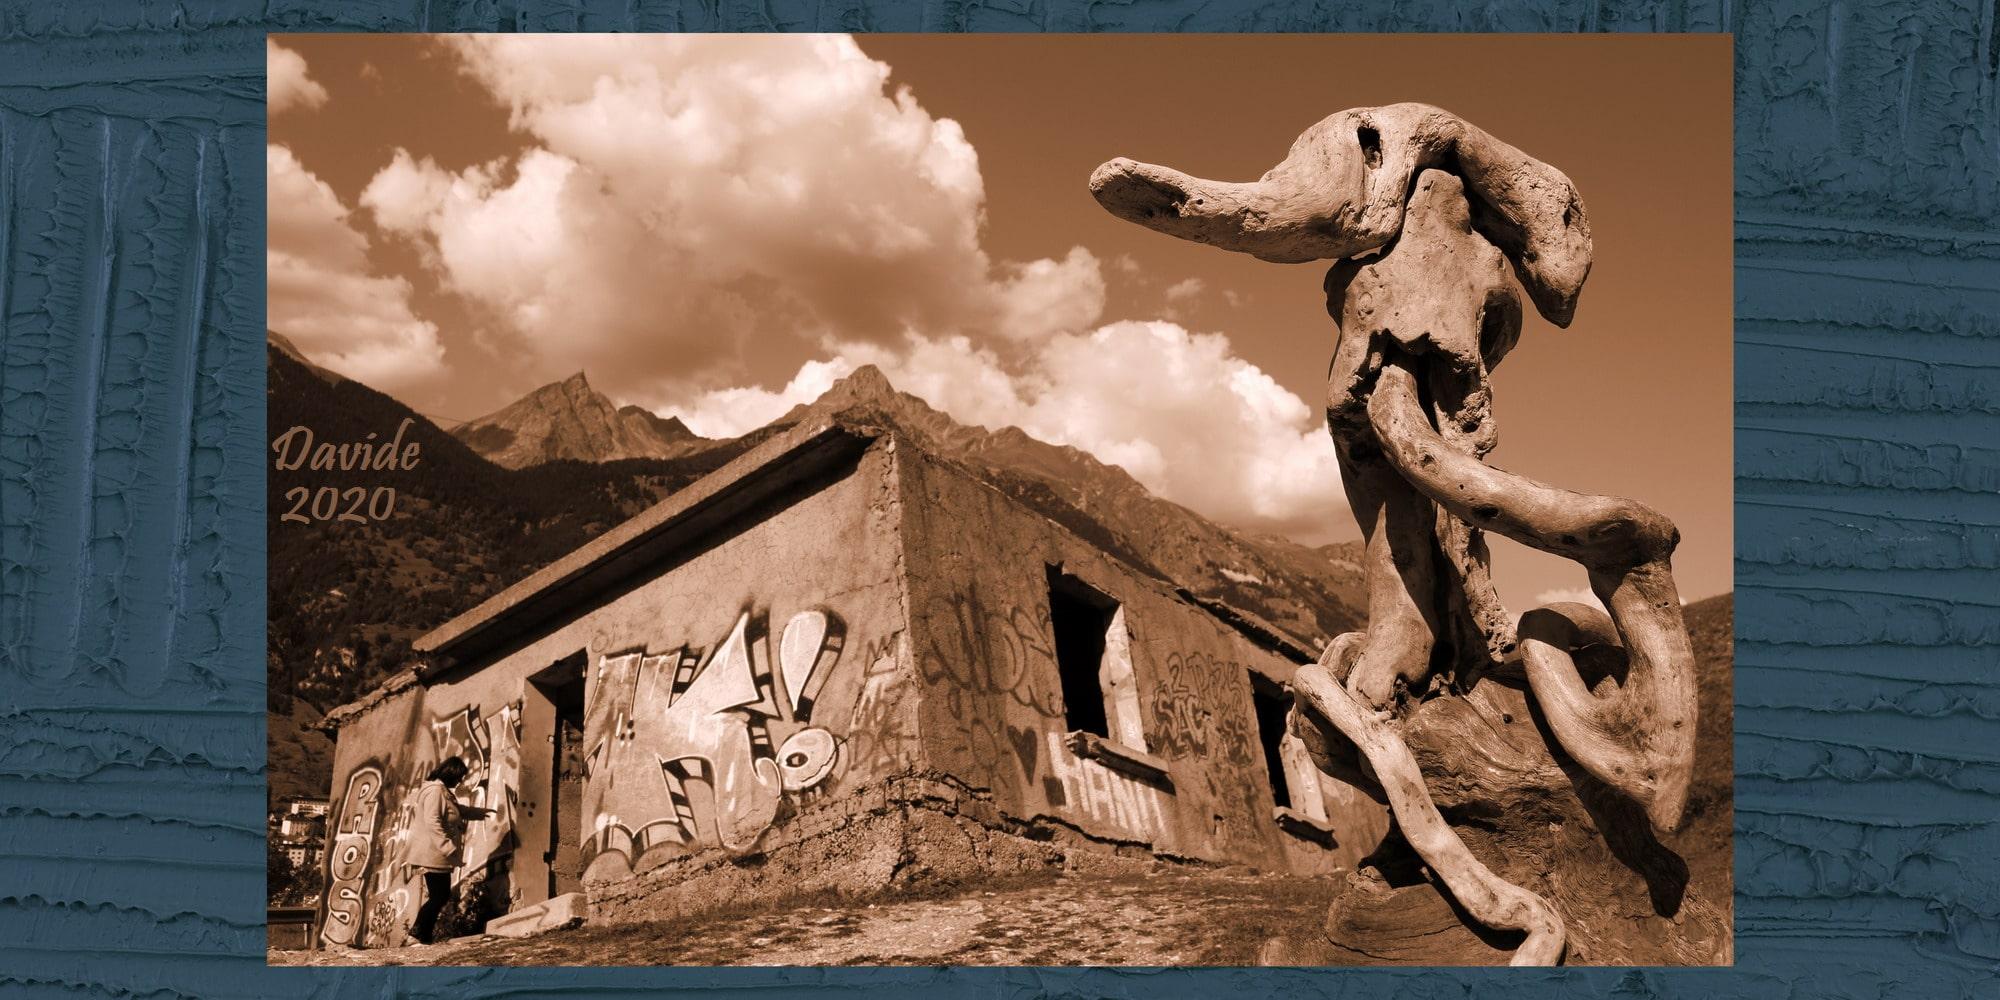 "Davide Tansini, ""Forme sfuggenti #66 – Maison Penchée"", 2020, fotografia digitale. Modane (Savoia, Alvernia-Rodano-Alpi – Val Moriana, Francia)"